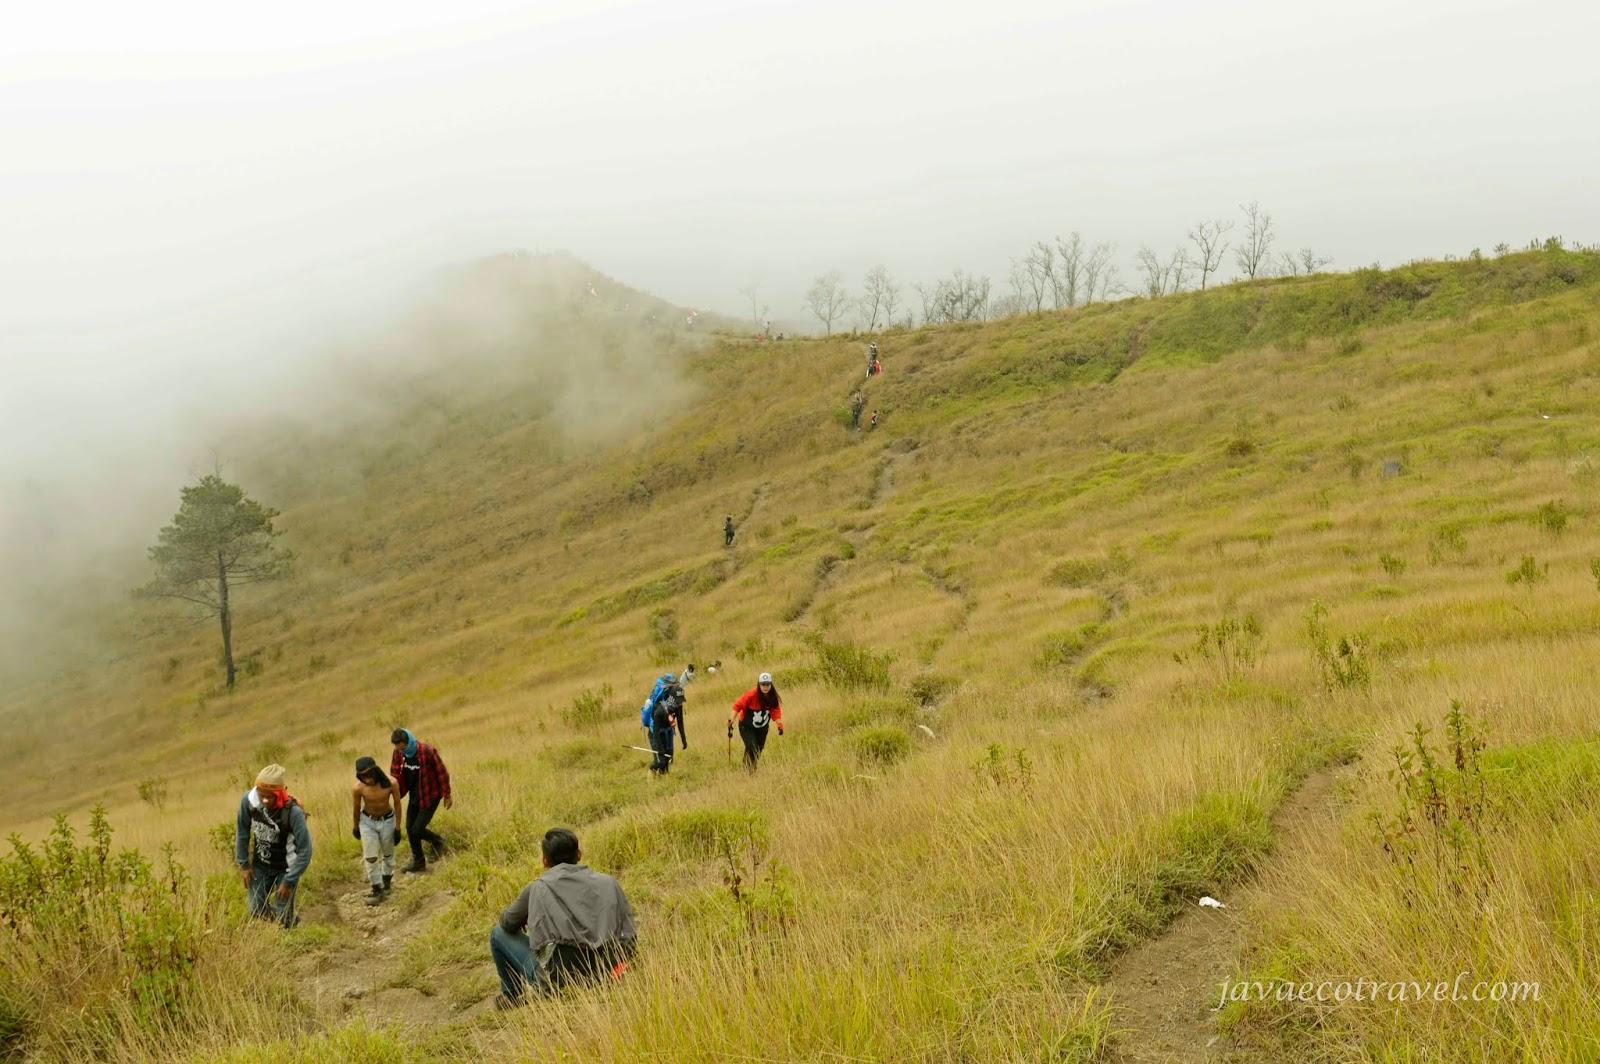 Mount Guntur